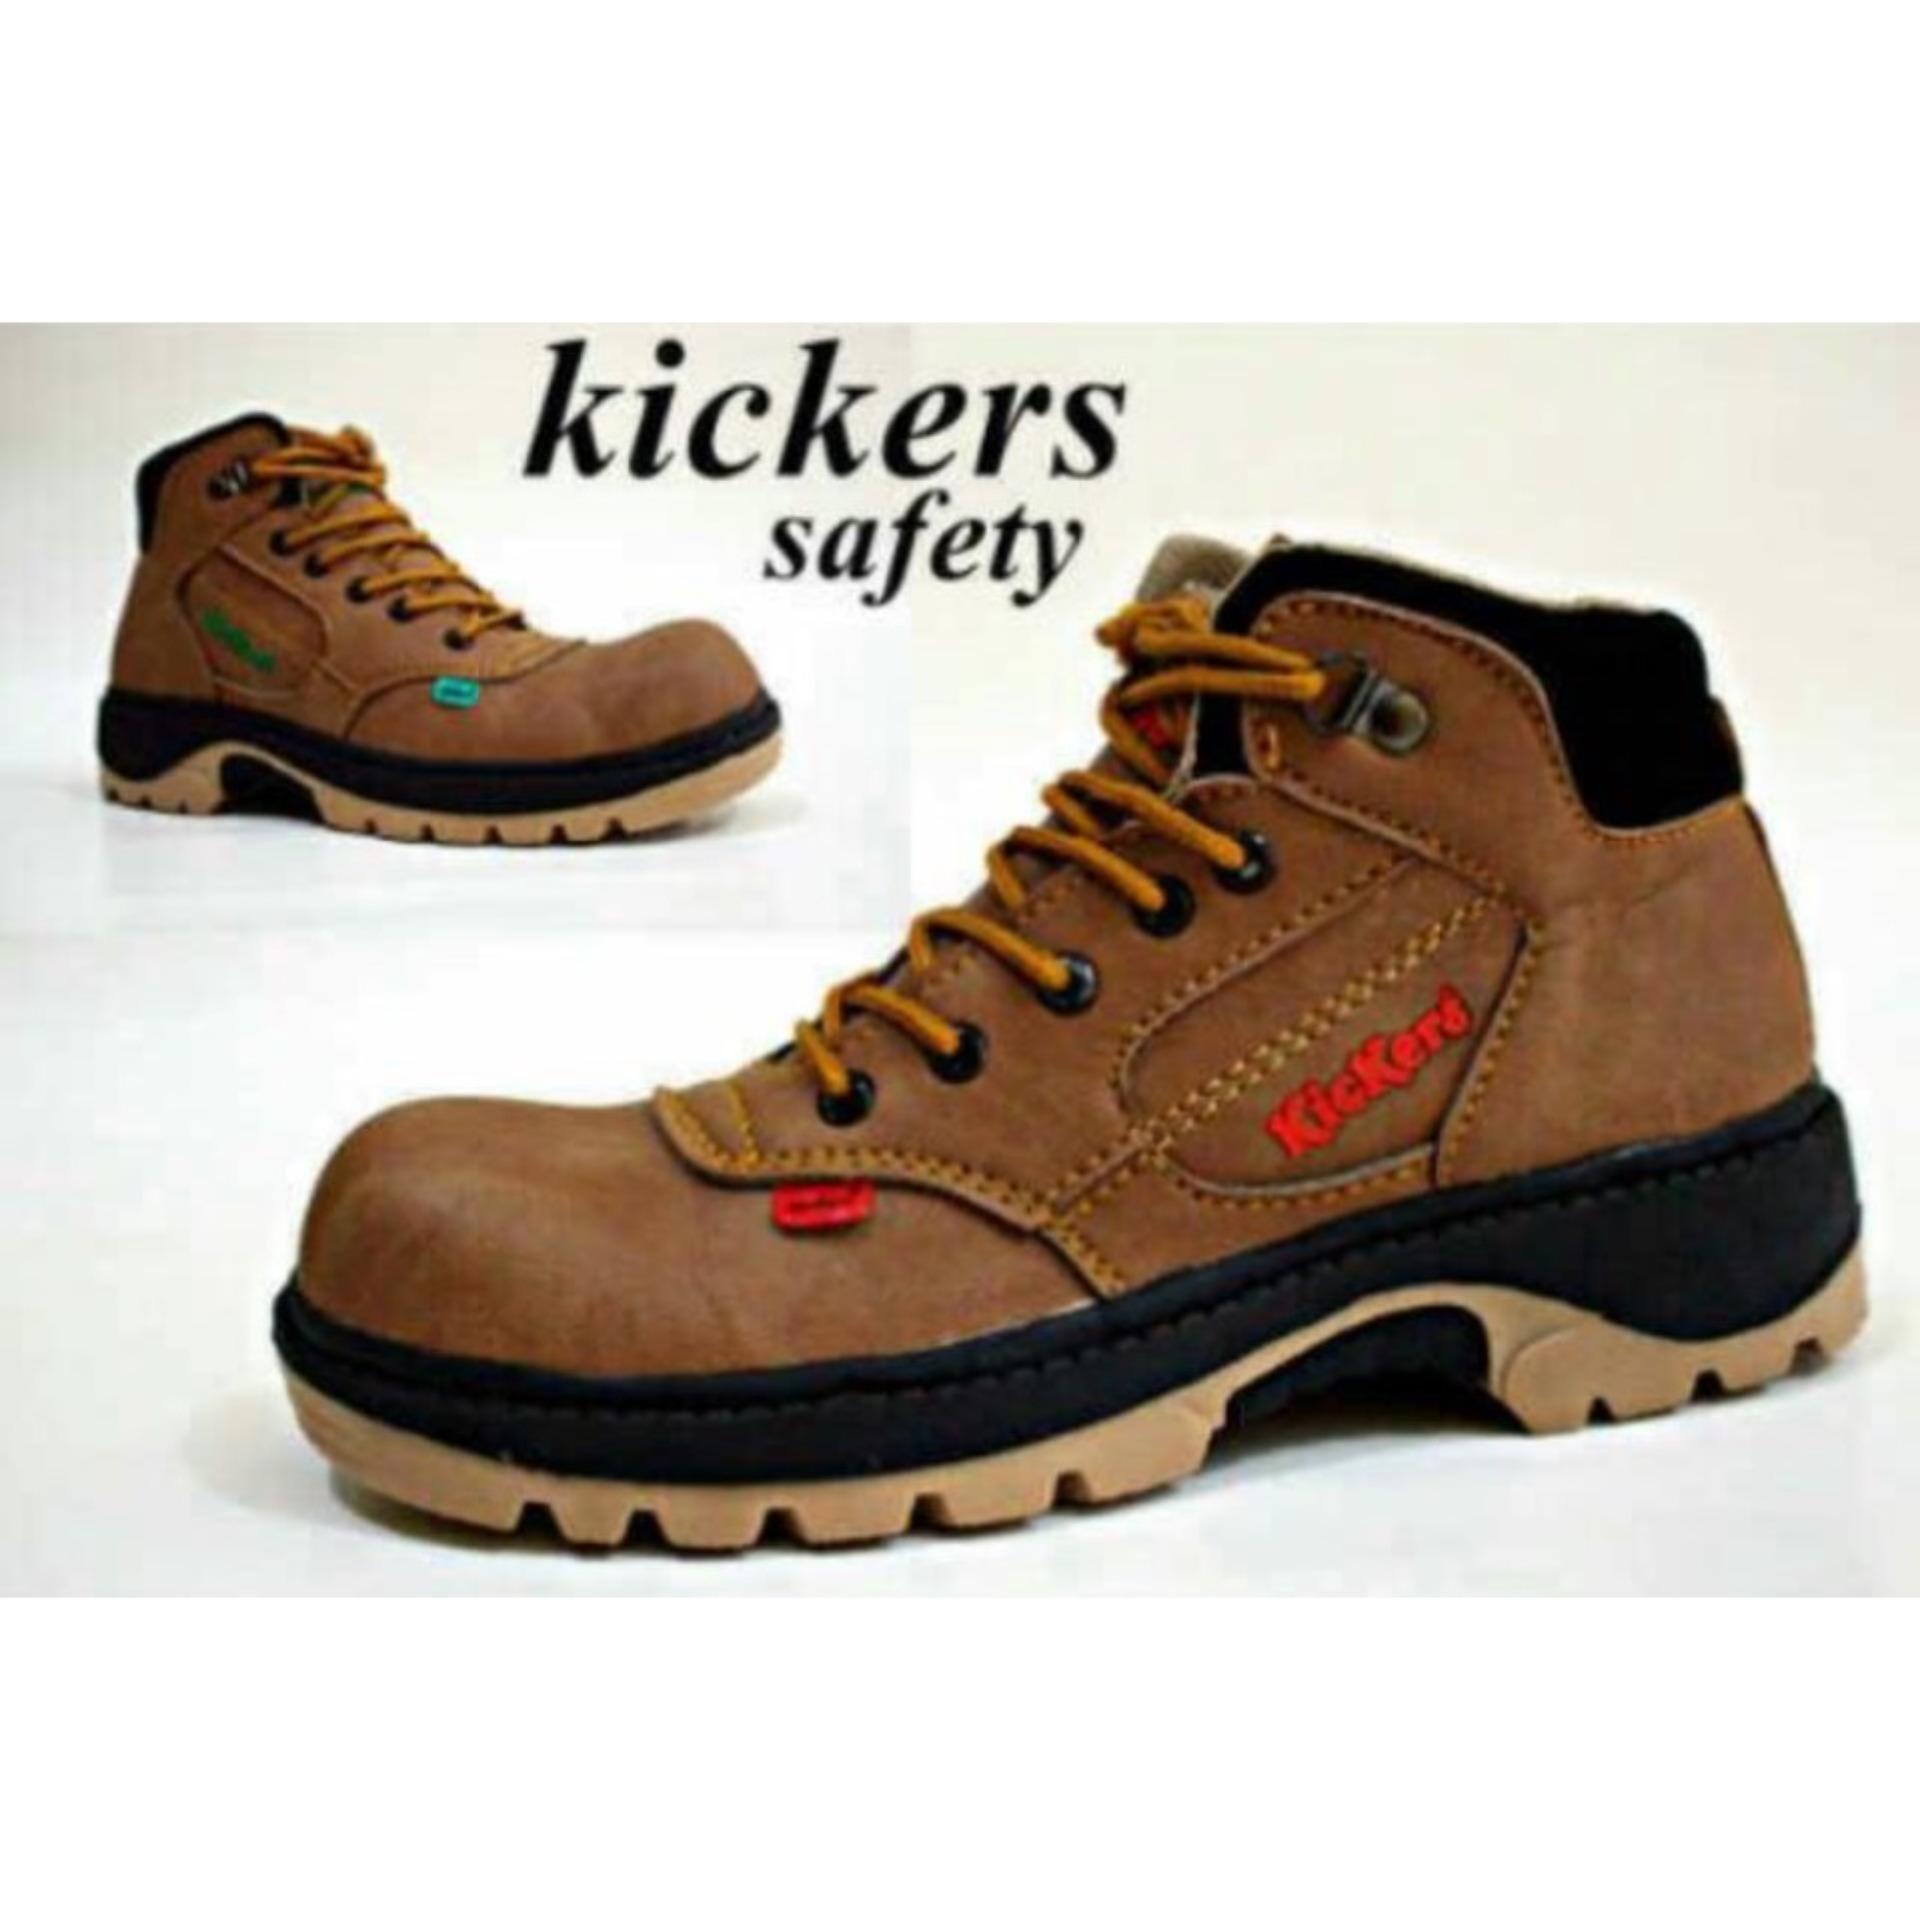 Berapa Harga Sepatu Boots Safety Kickers Pria Hitam Brown Tan Cream Di Jawa Barat